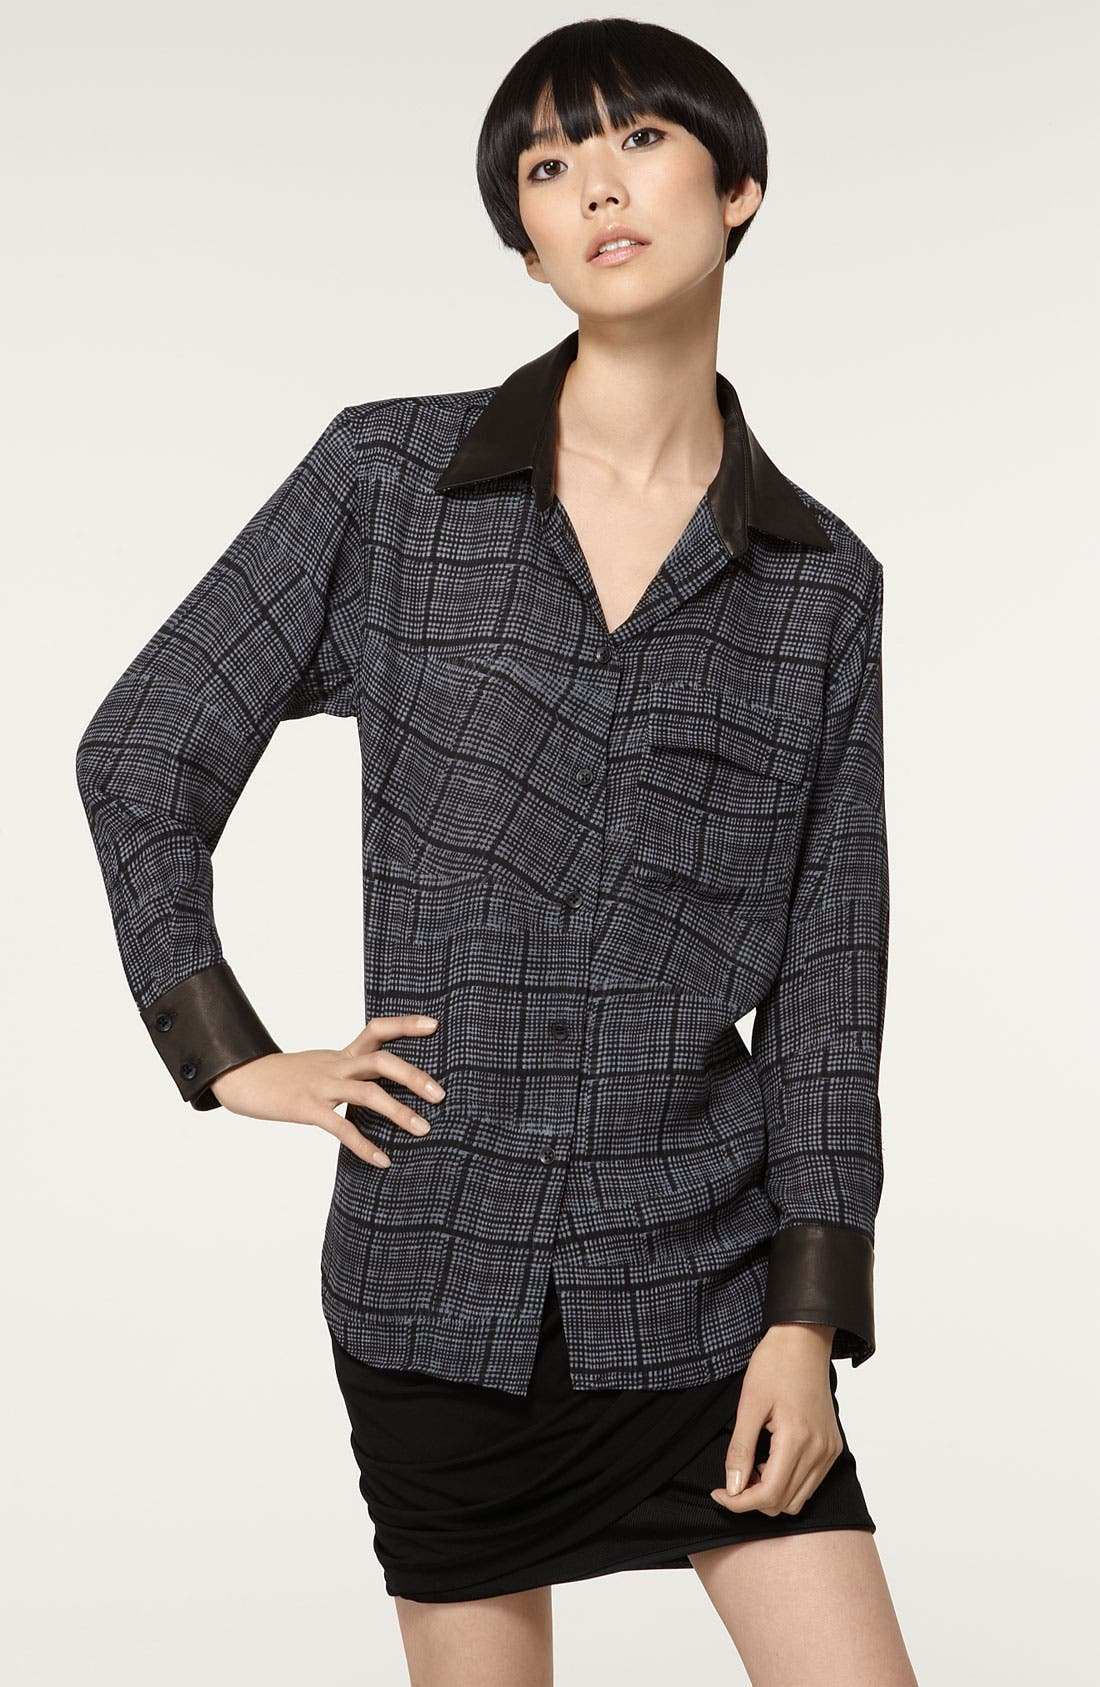 Alternate Image 1 Selected - Rag & Bone 'Marais' Lambskin Leather Trim Silk Shirt